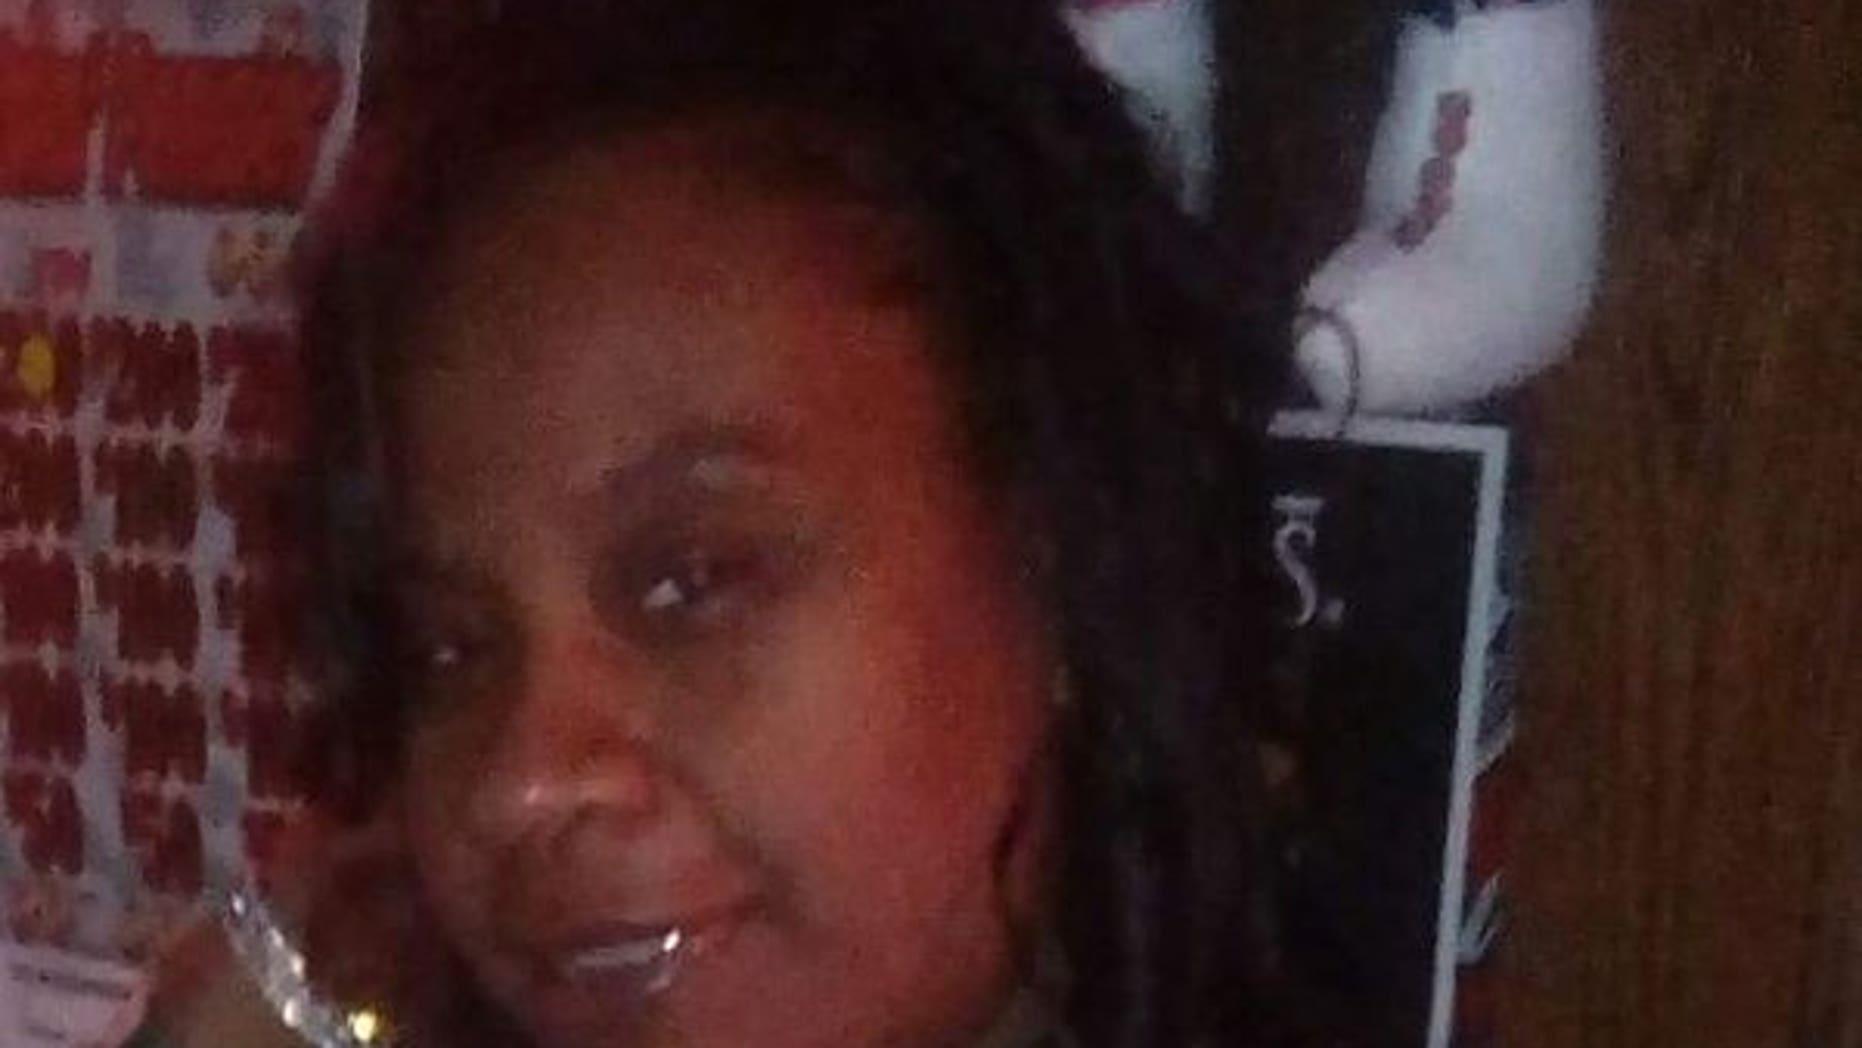 36-year-old mom Aisha Freels died in the crash.